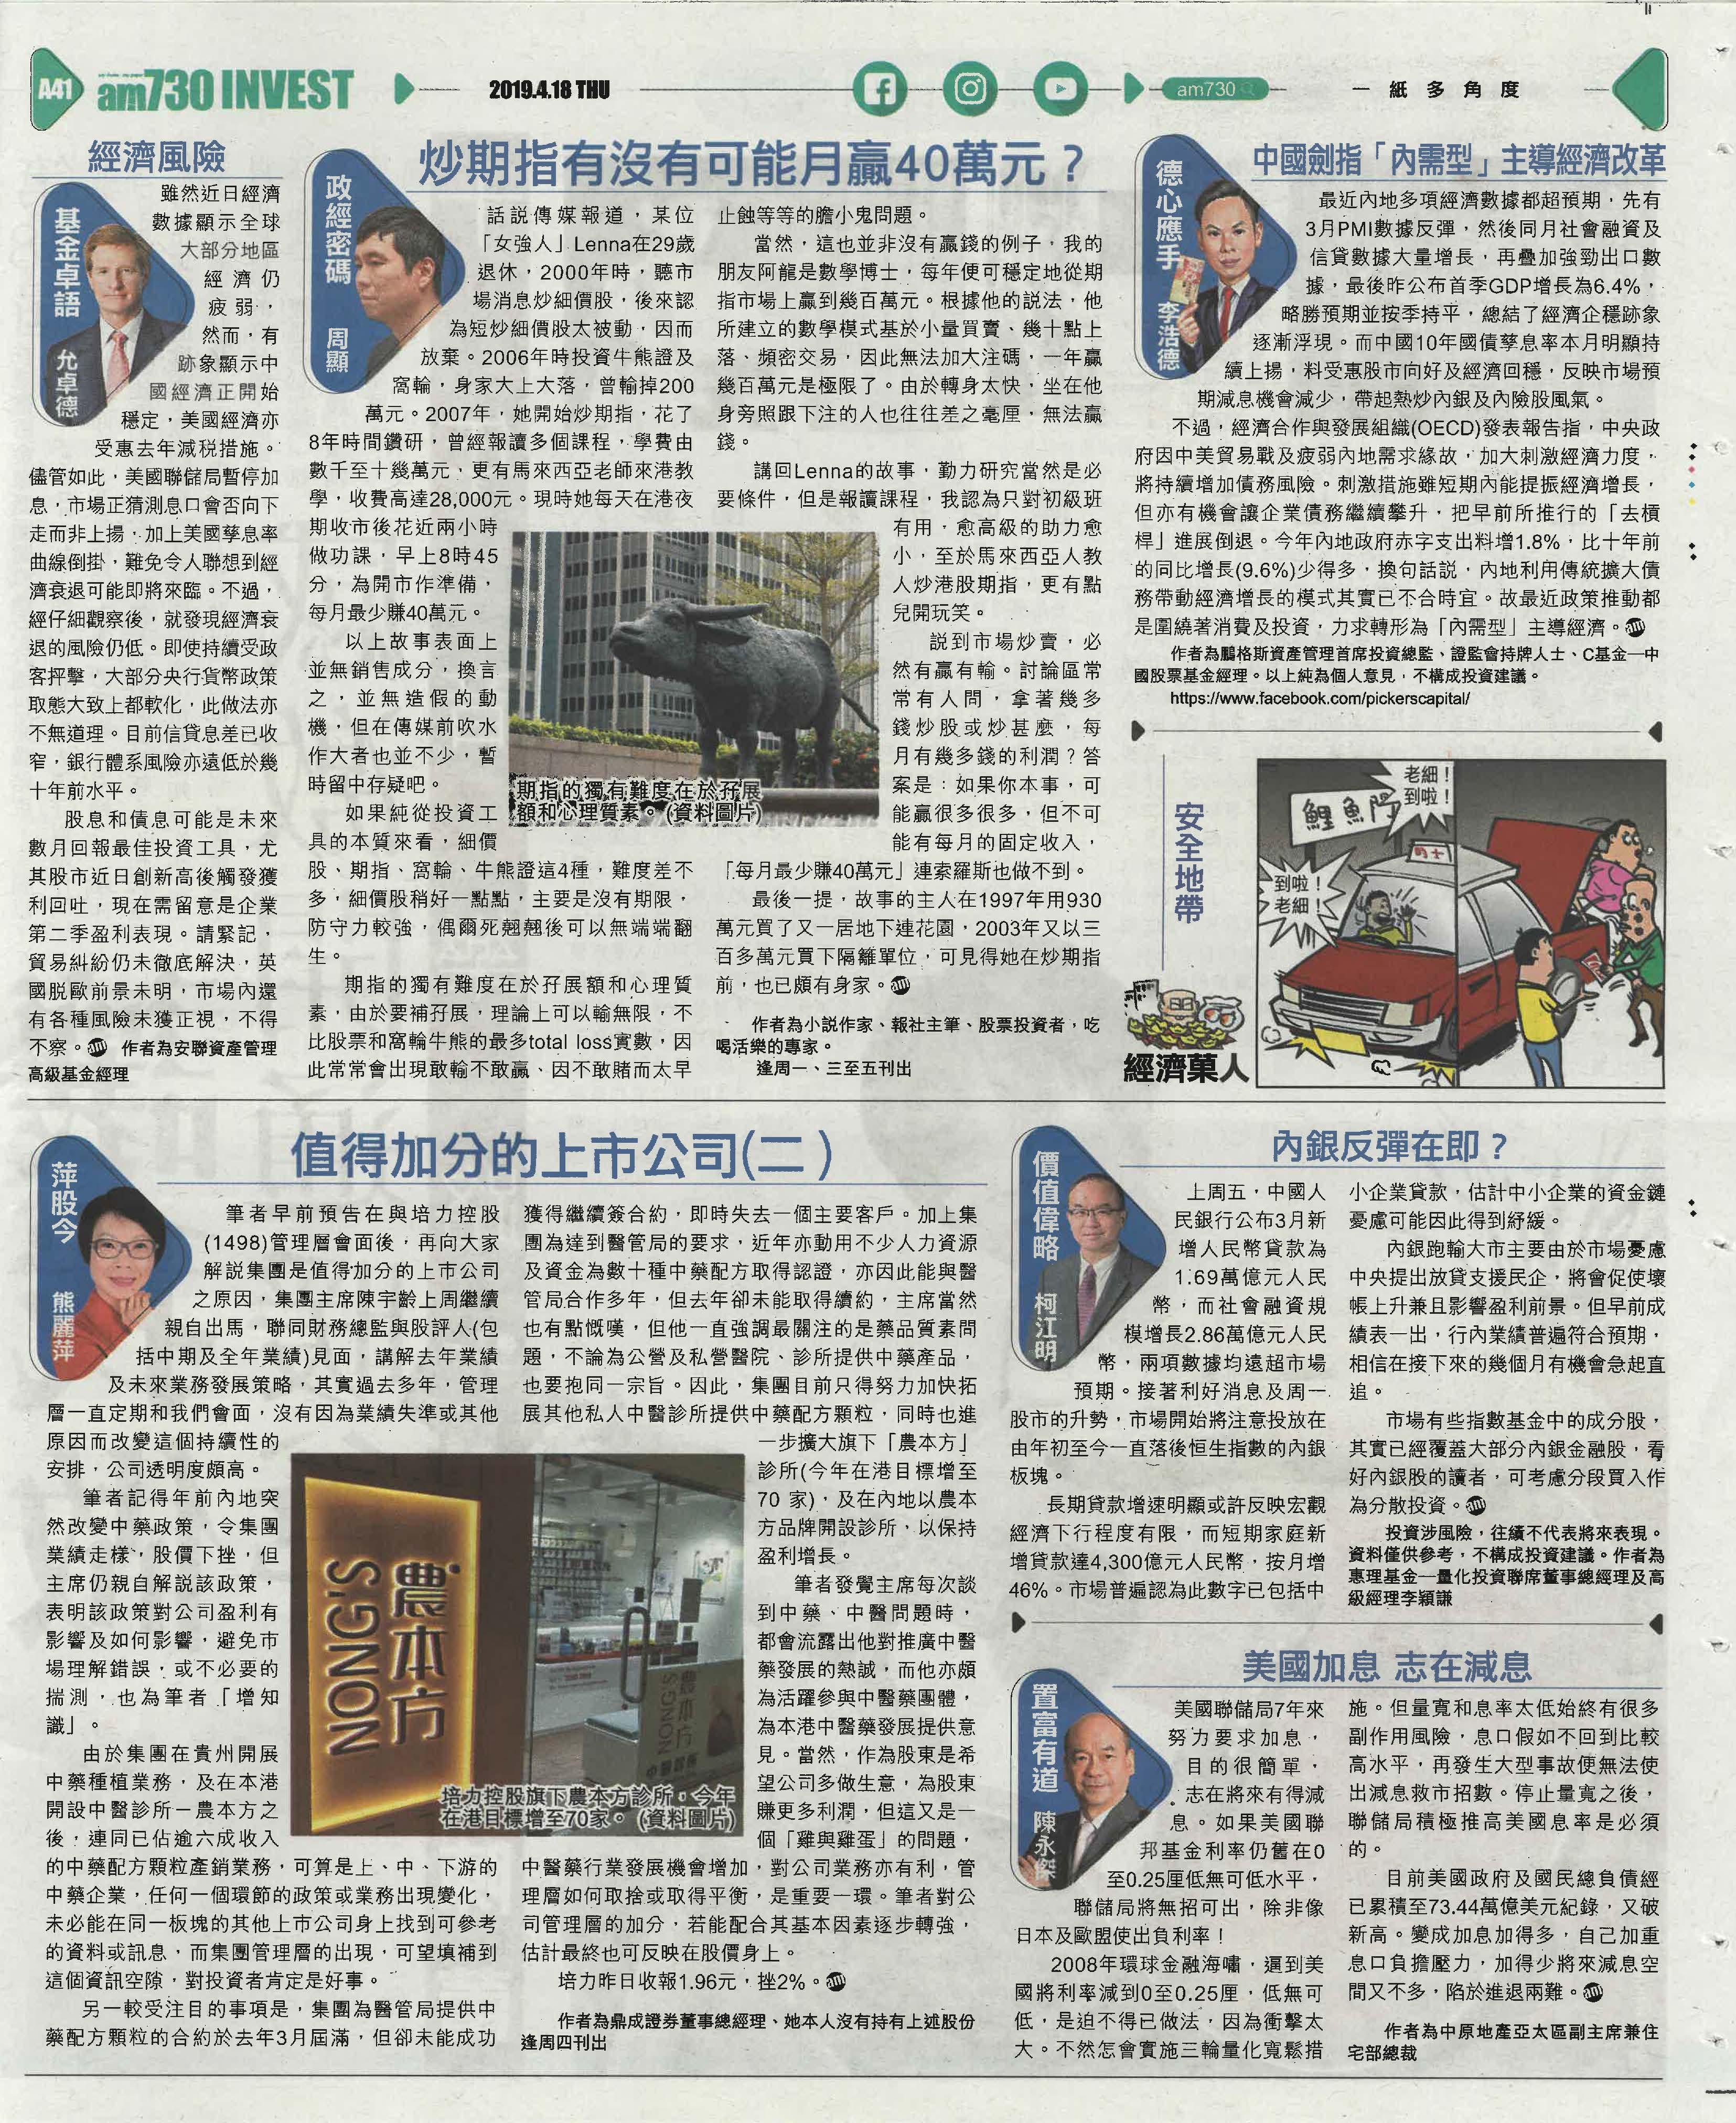 2019-04-18 am730 pg. A41 '值得加分的上市公司(二)' (18 Apr 2019)_頁面_2